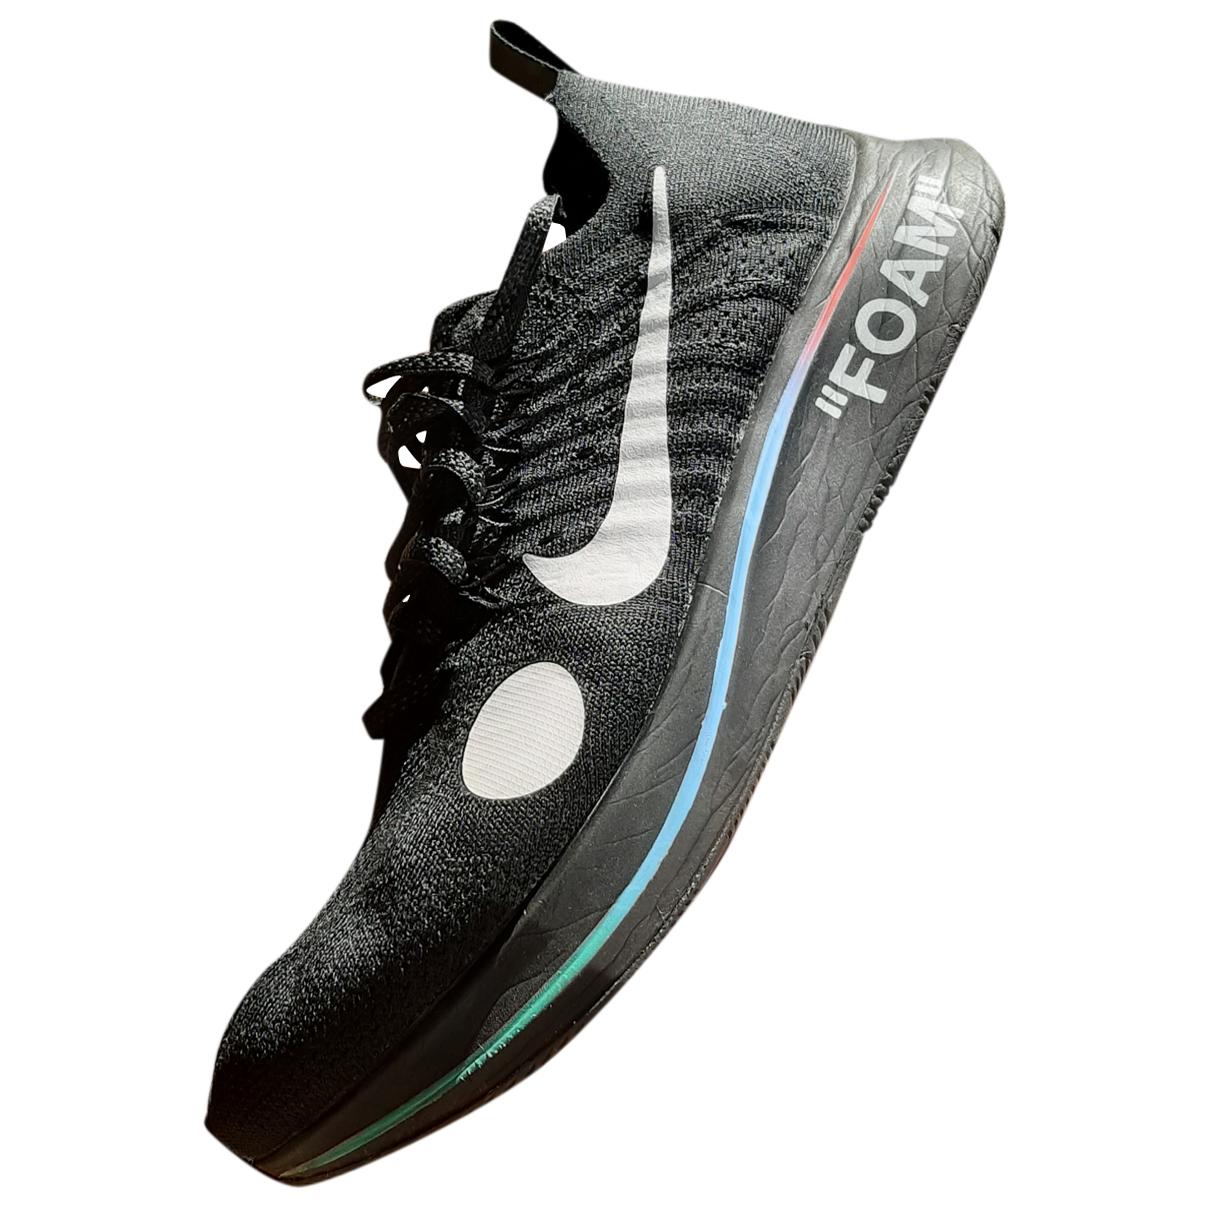 Nike X Off-white - Baskets Zoom Fly Mercurial pour homme en toile - noir